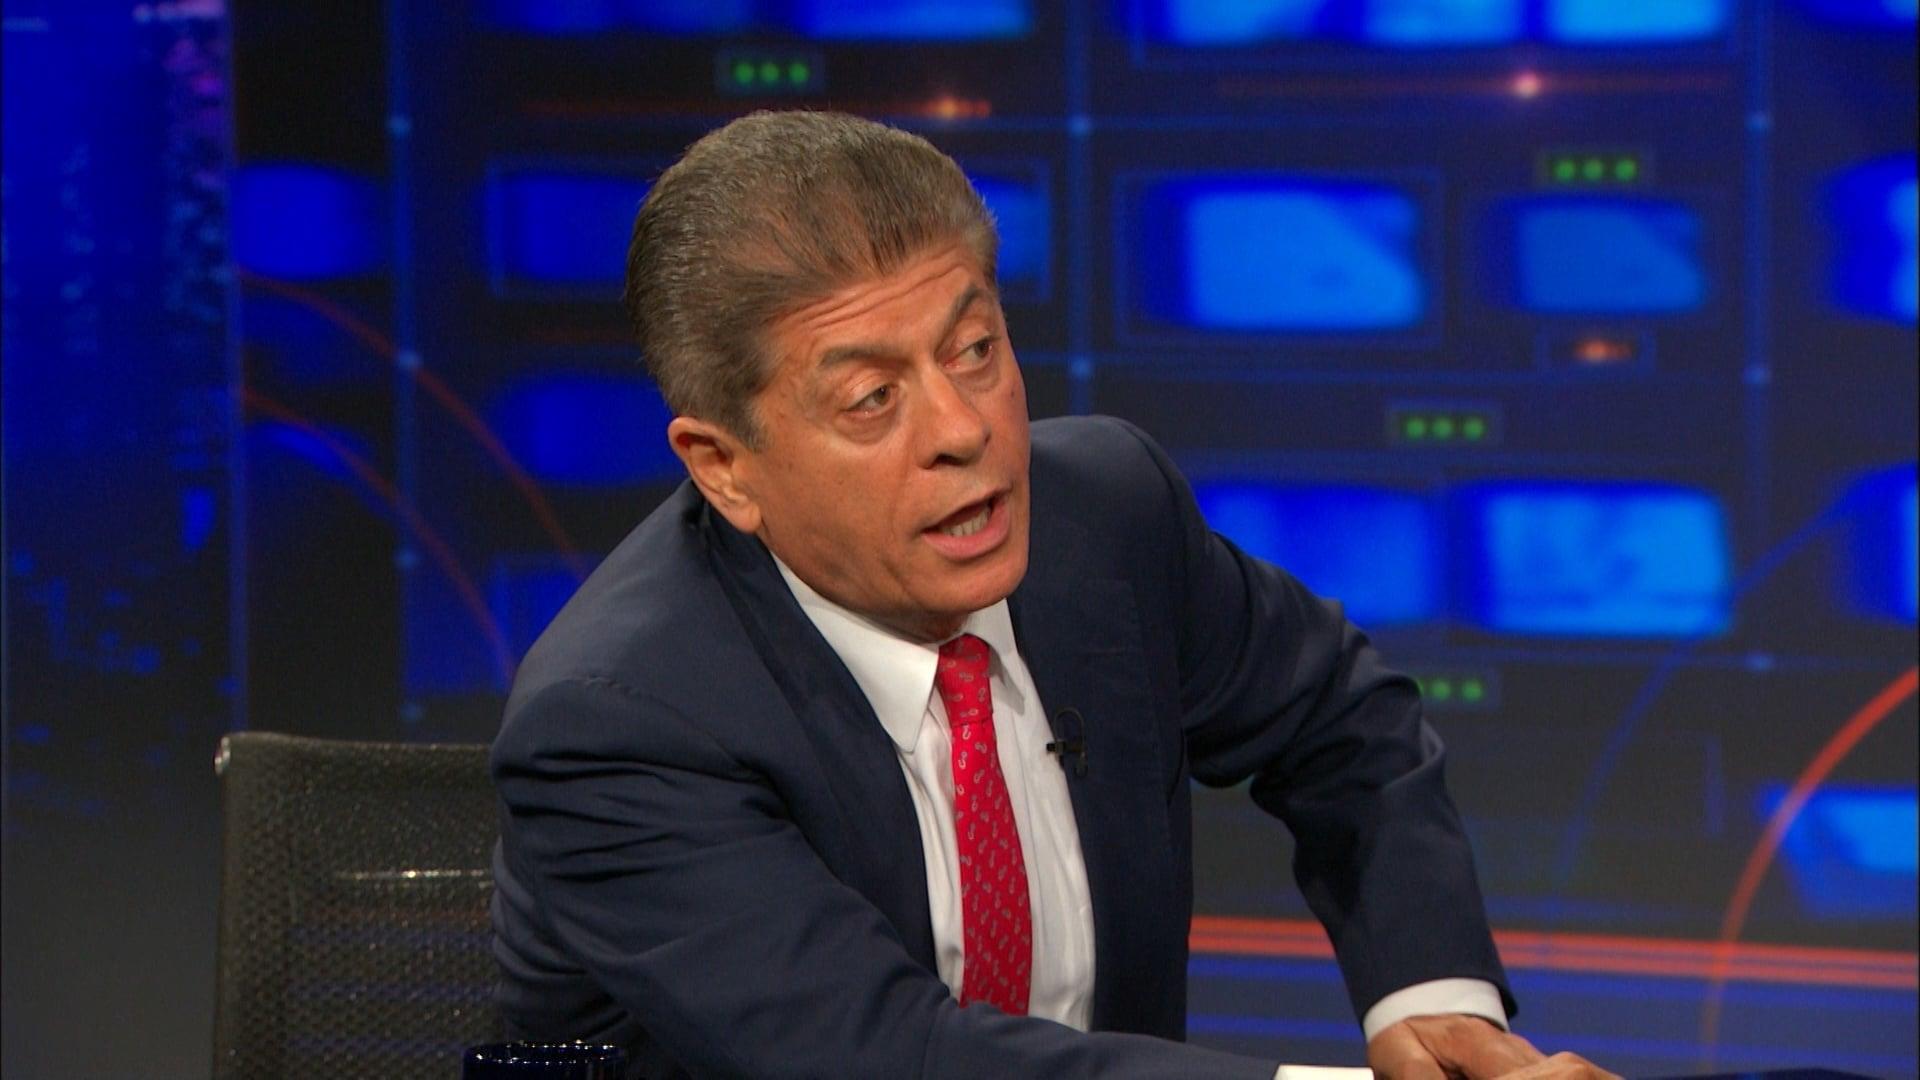 The Daily Show with Trevor Noah Season 20 :Episode 125  Andrew Napolitano